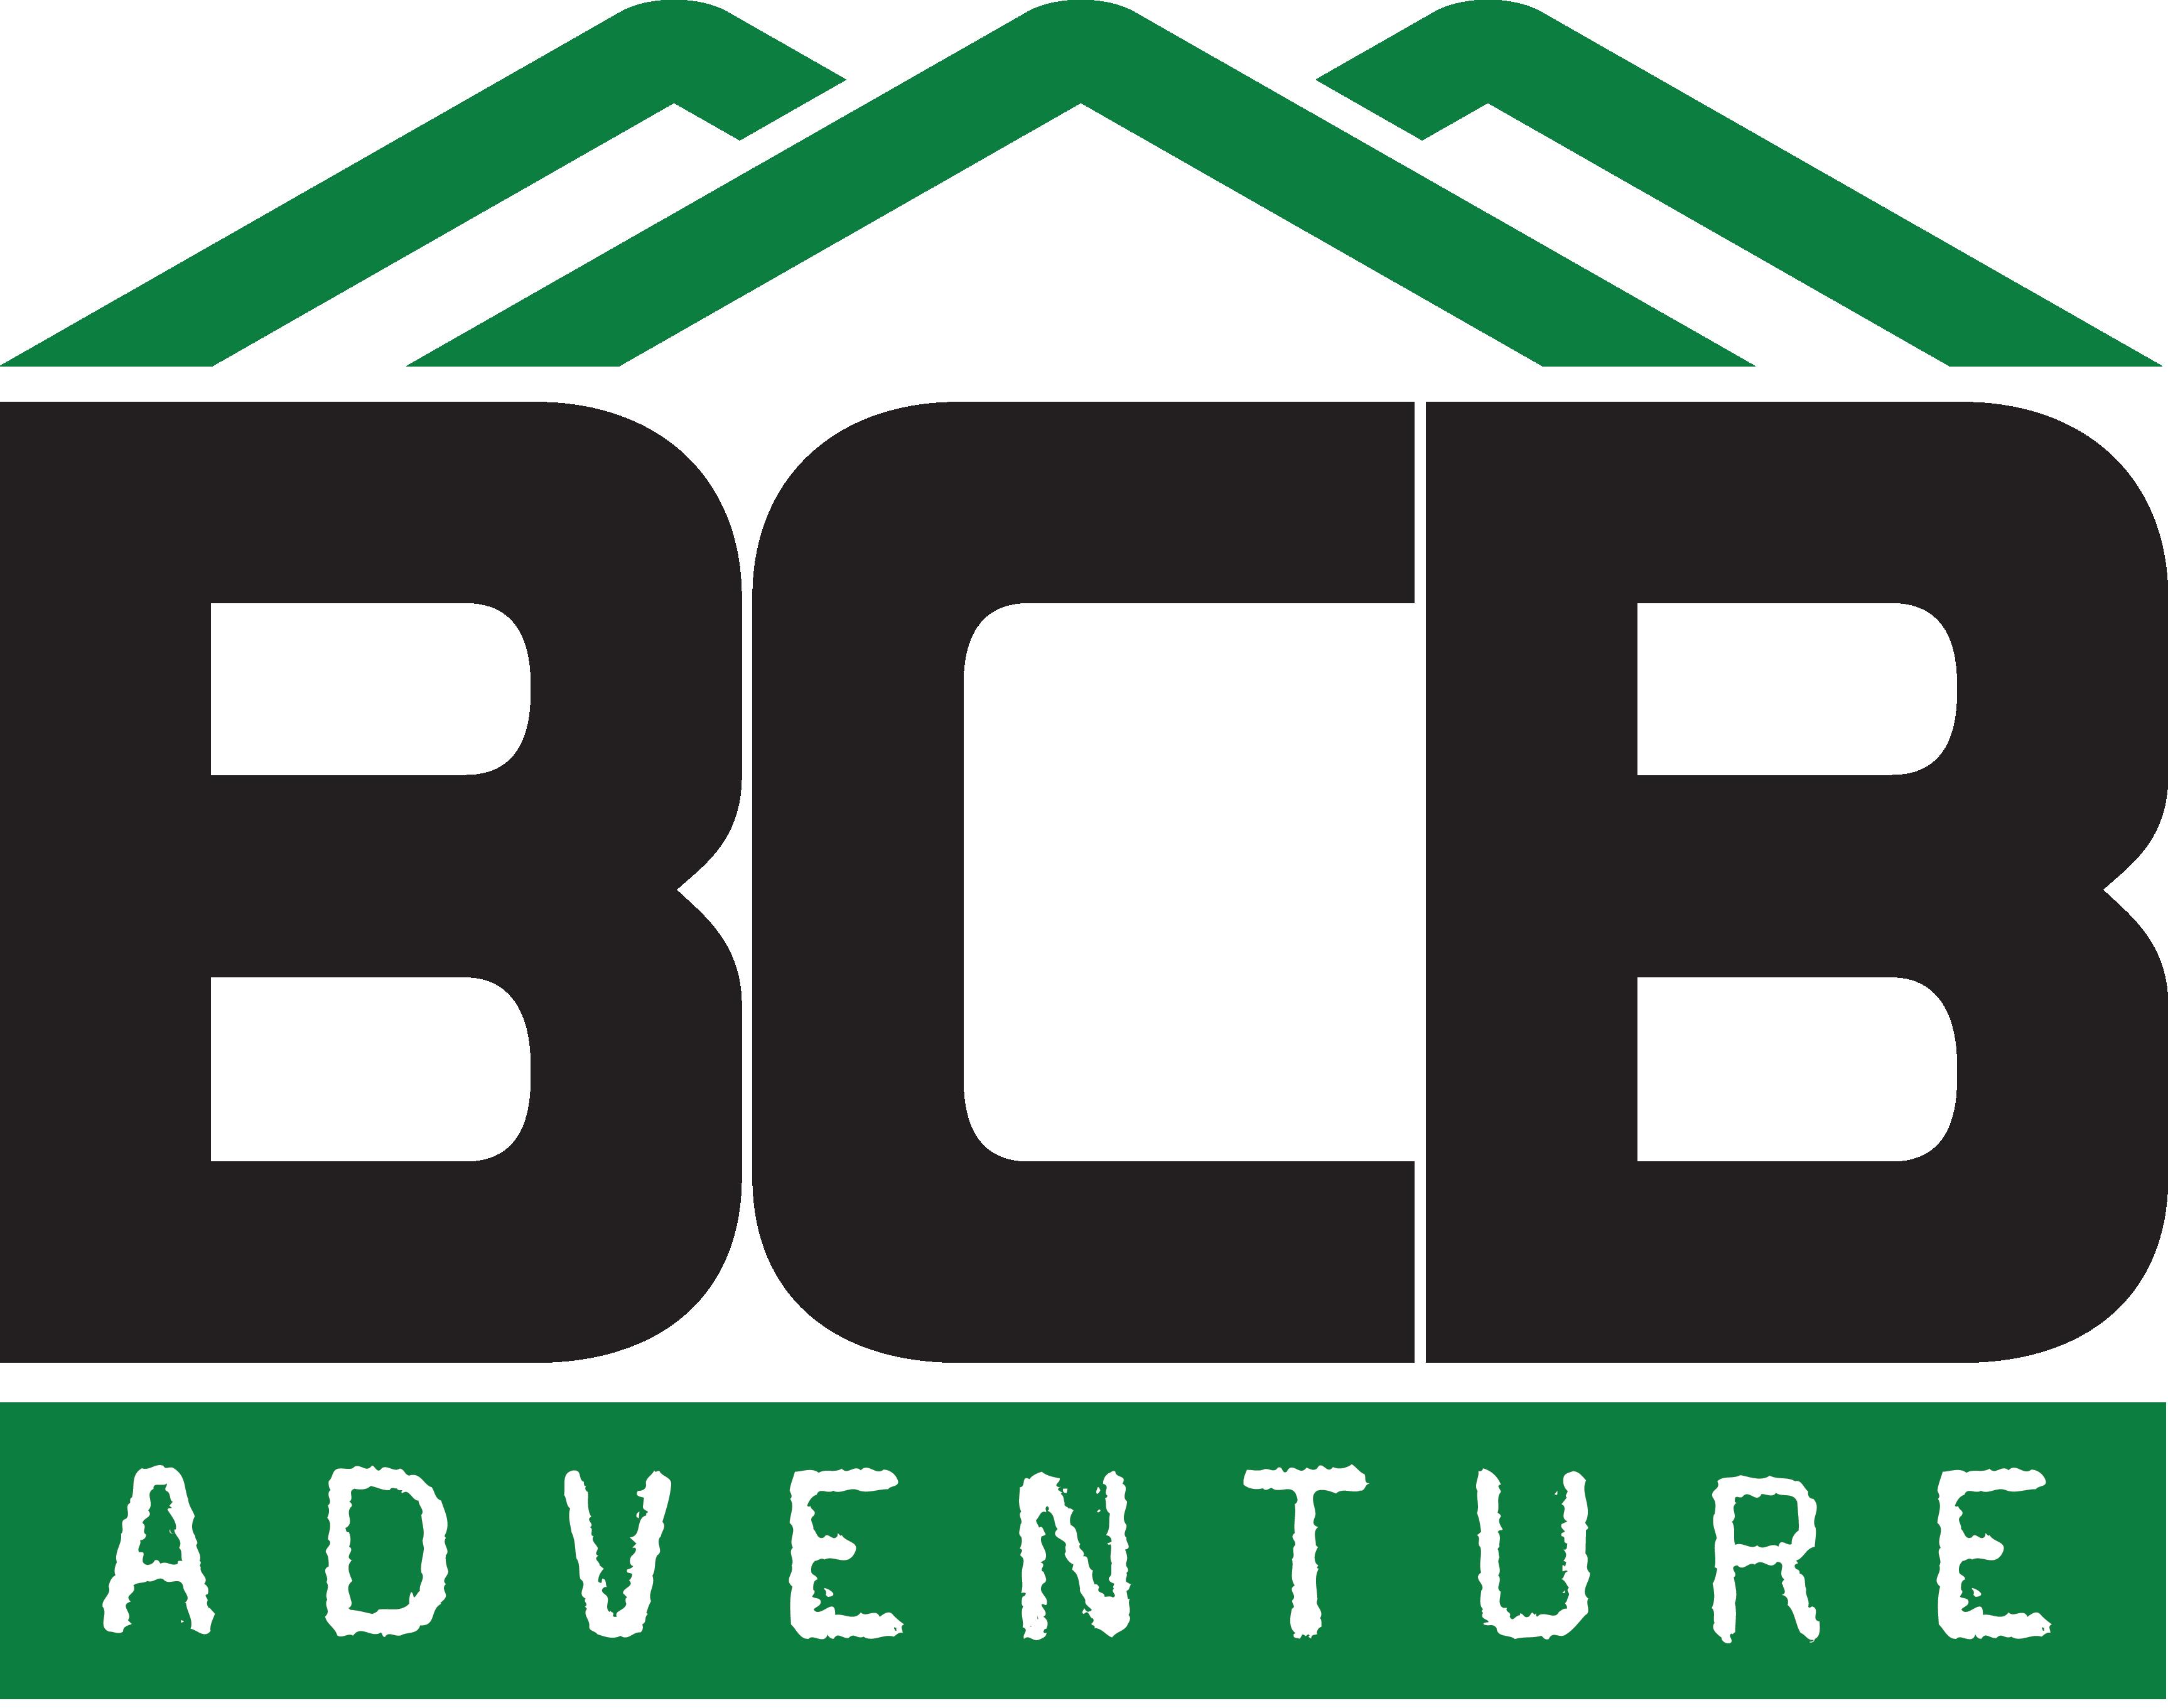 BCB Adventure Logo.